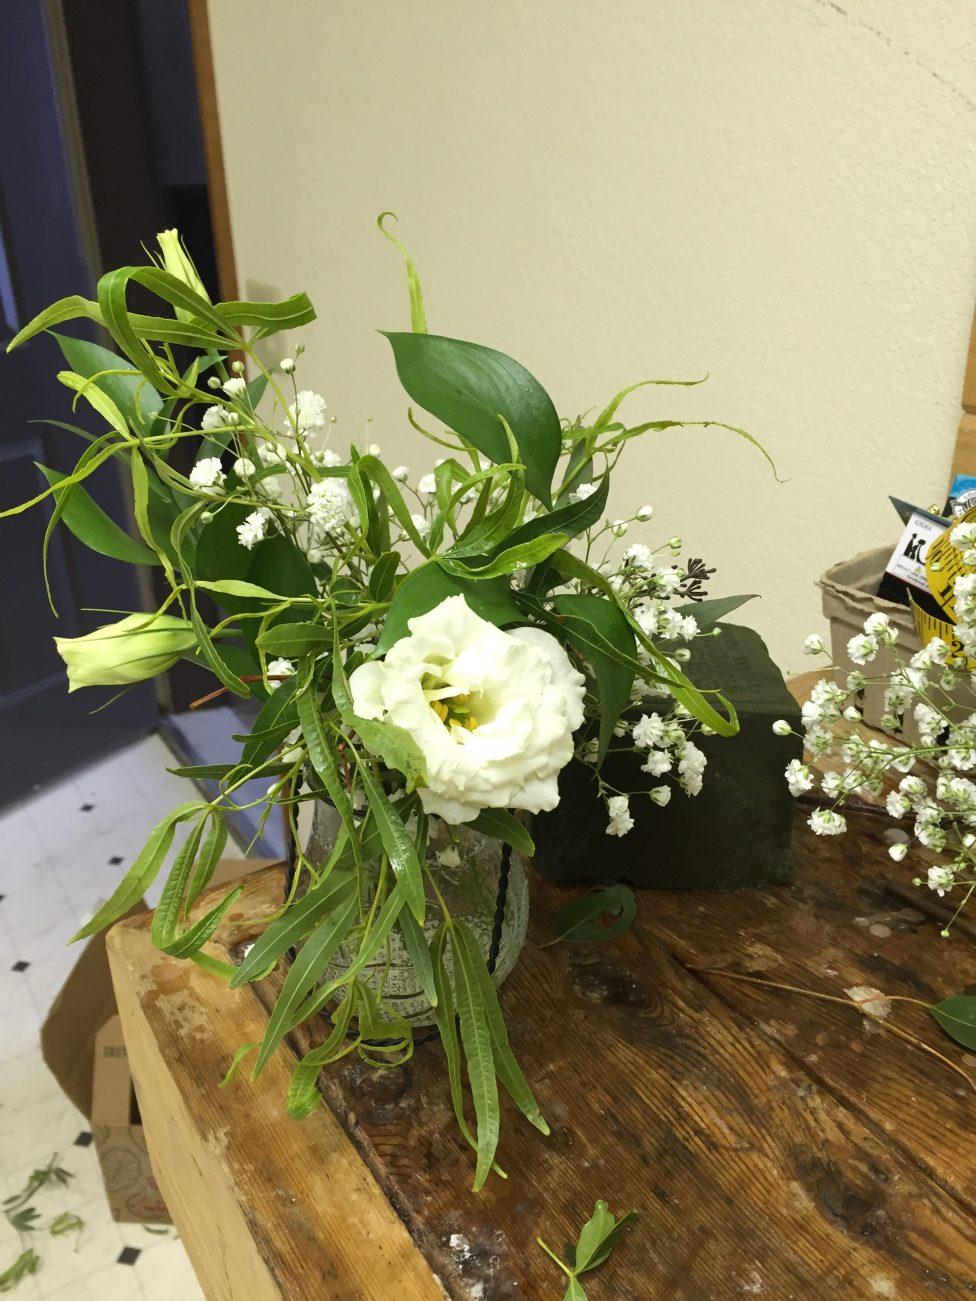 Bud Vases In Process